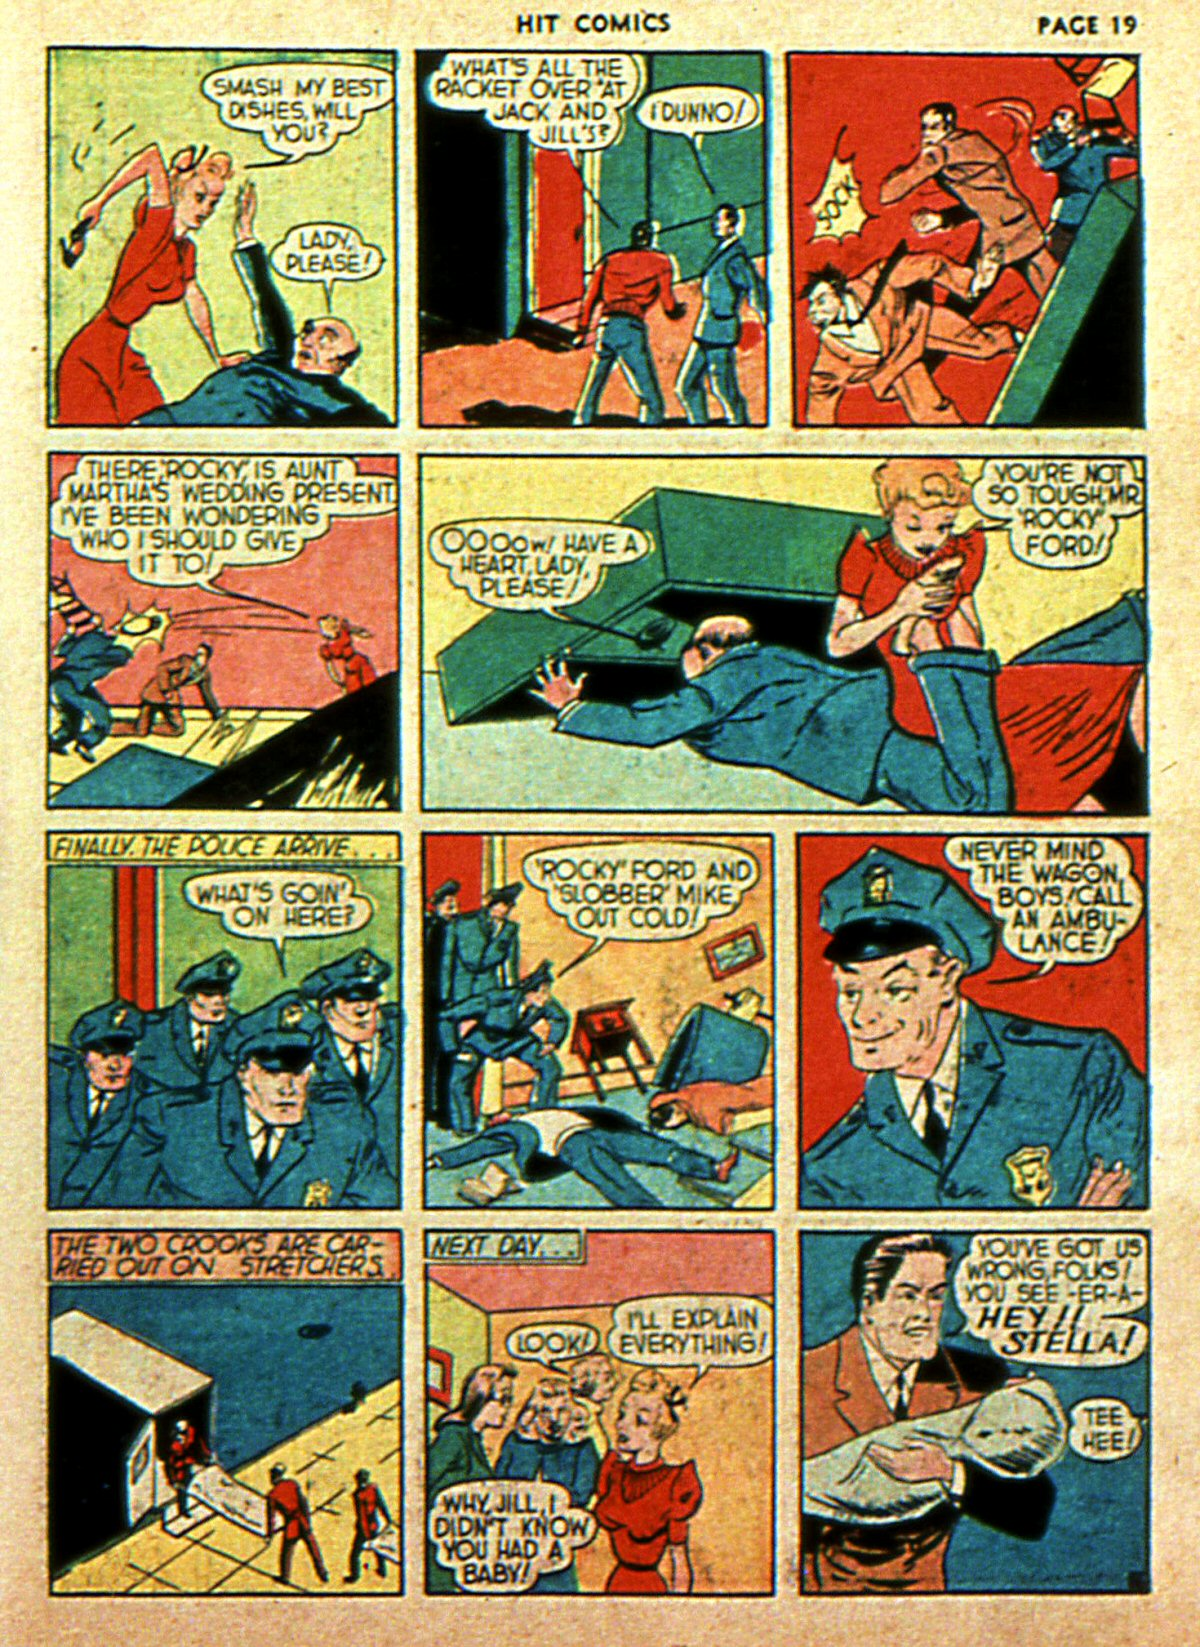 Read online Hit Comics comic -  Issue #2 - 21